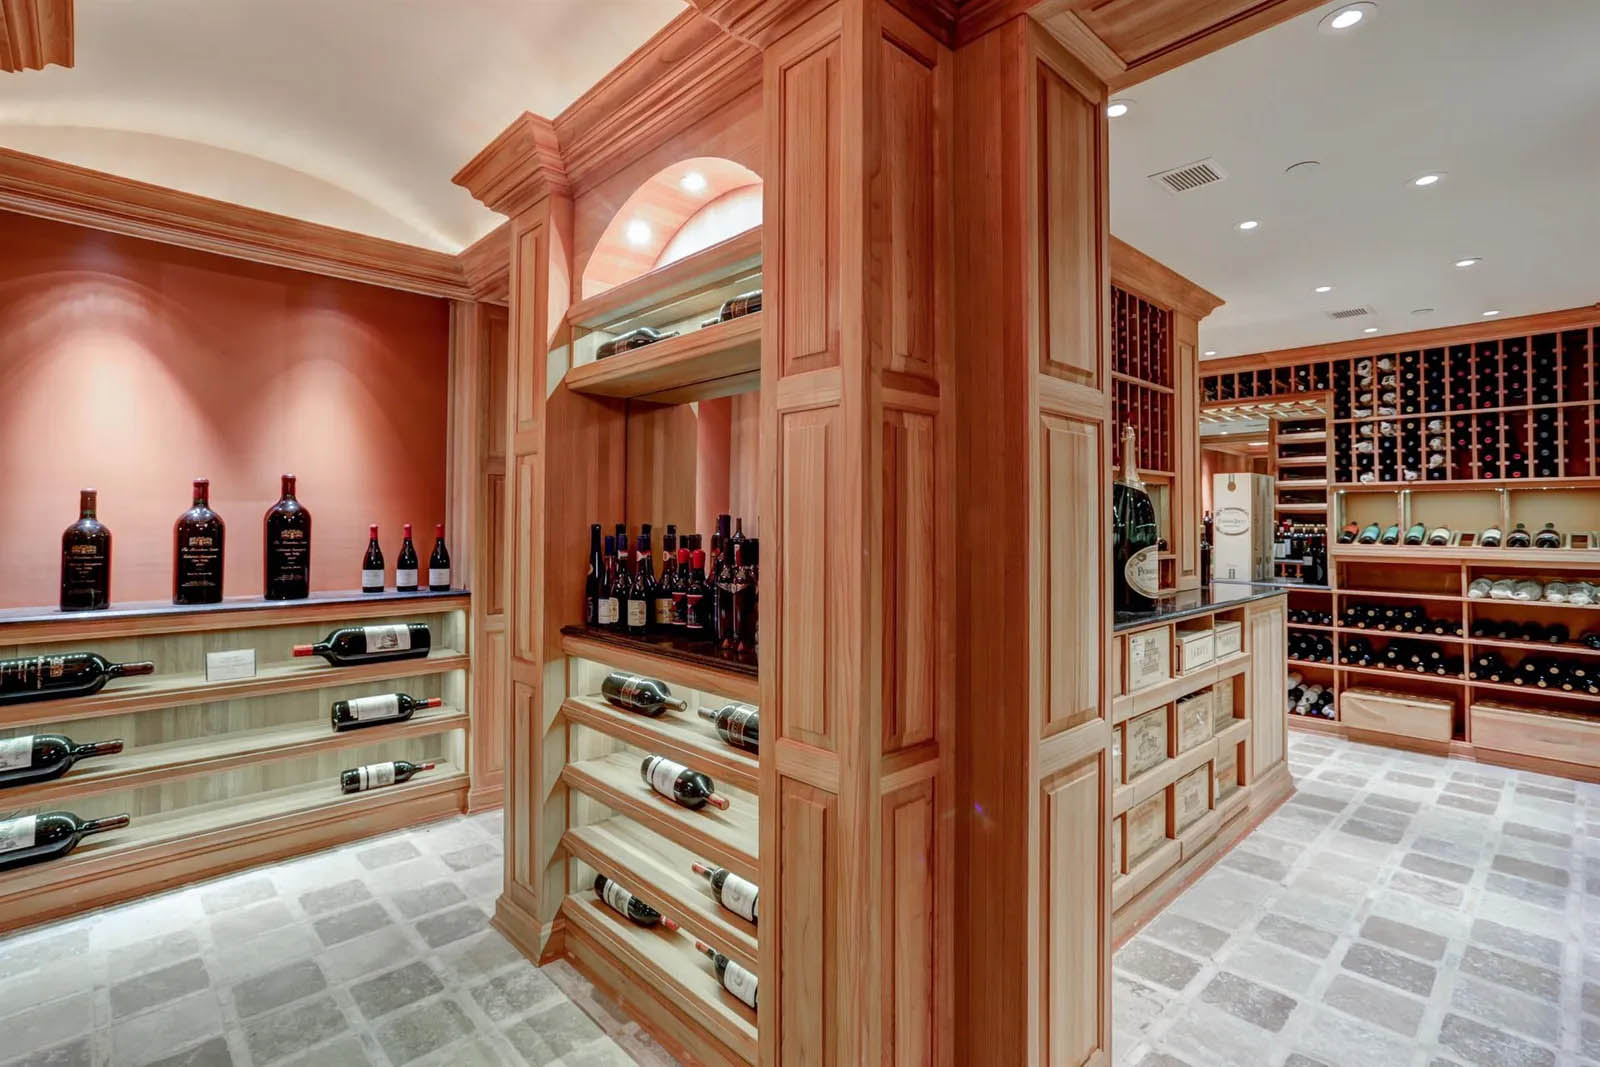 Large wine room featuring custom wood racks and shelves.